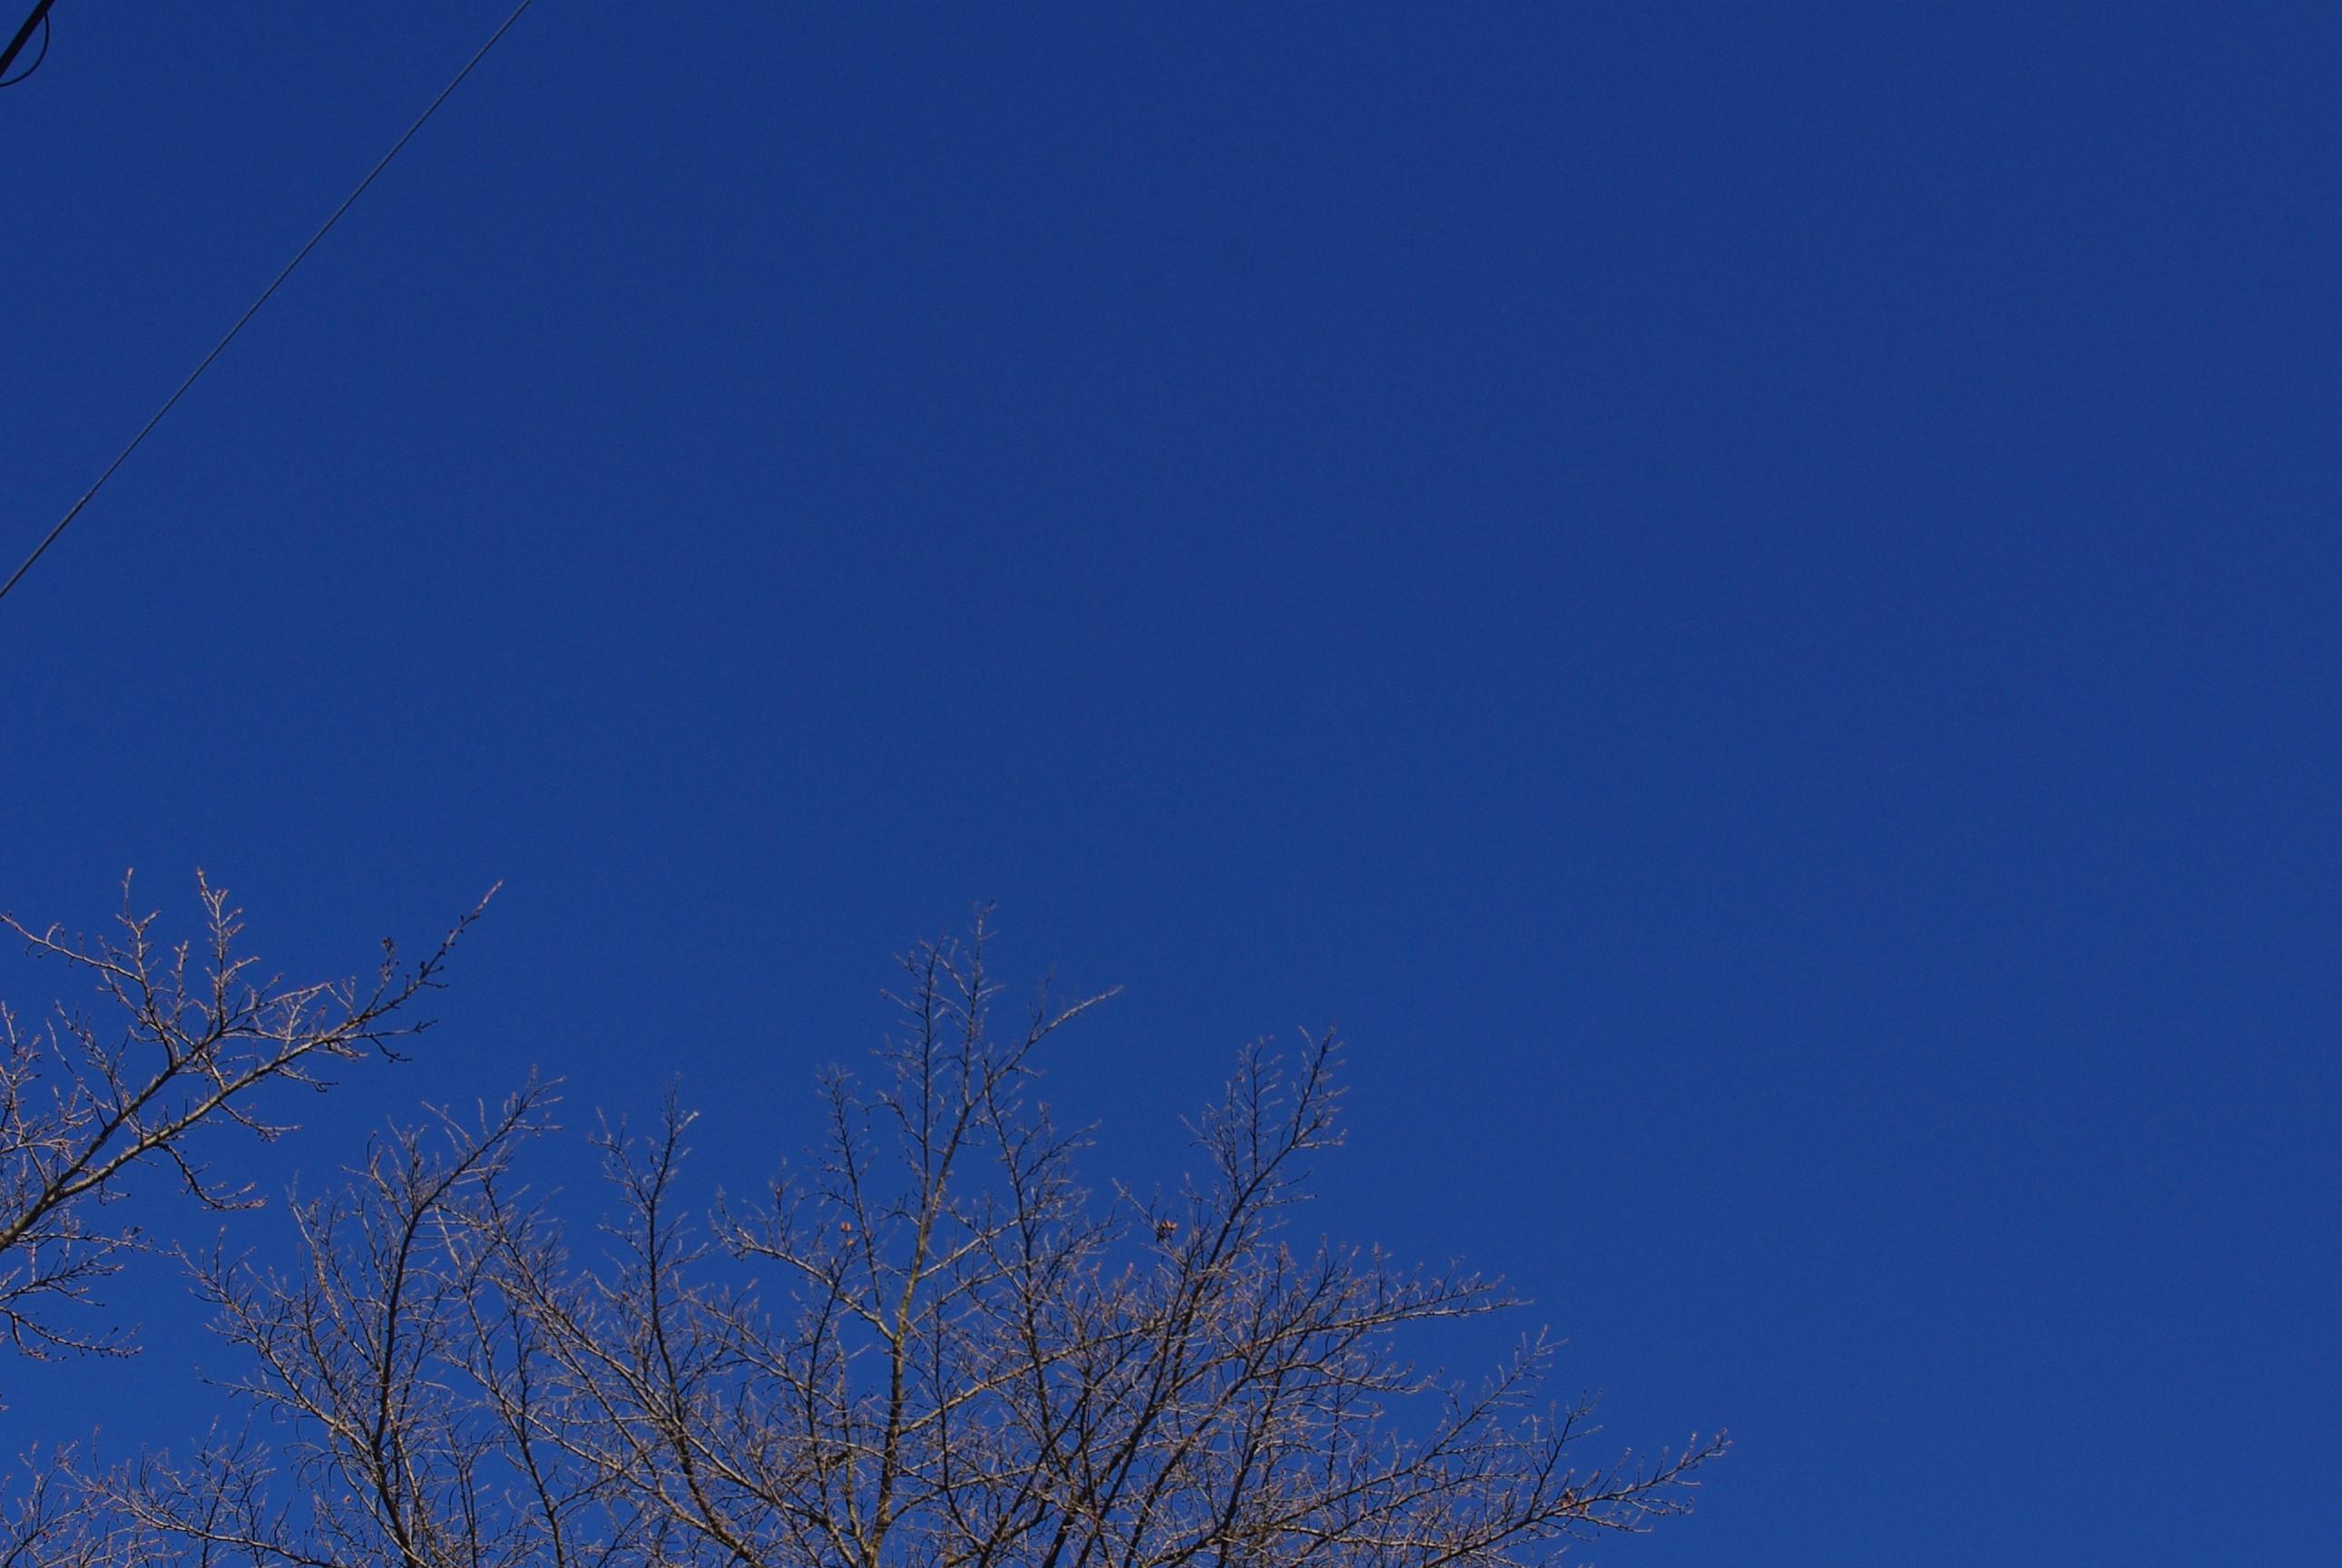 K_skyblue.jpg